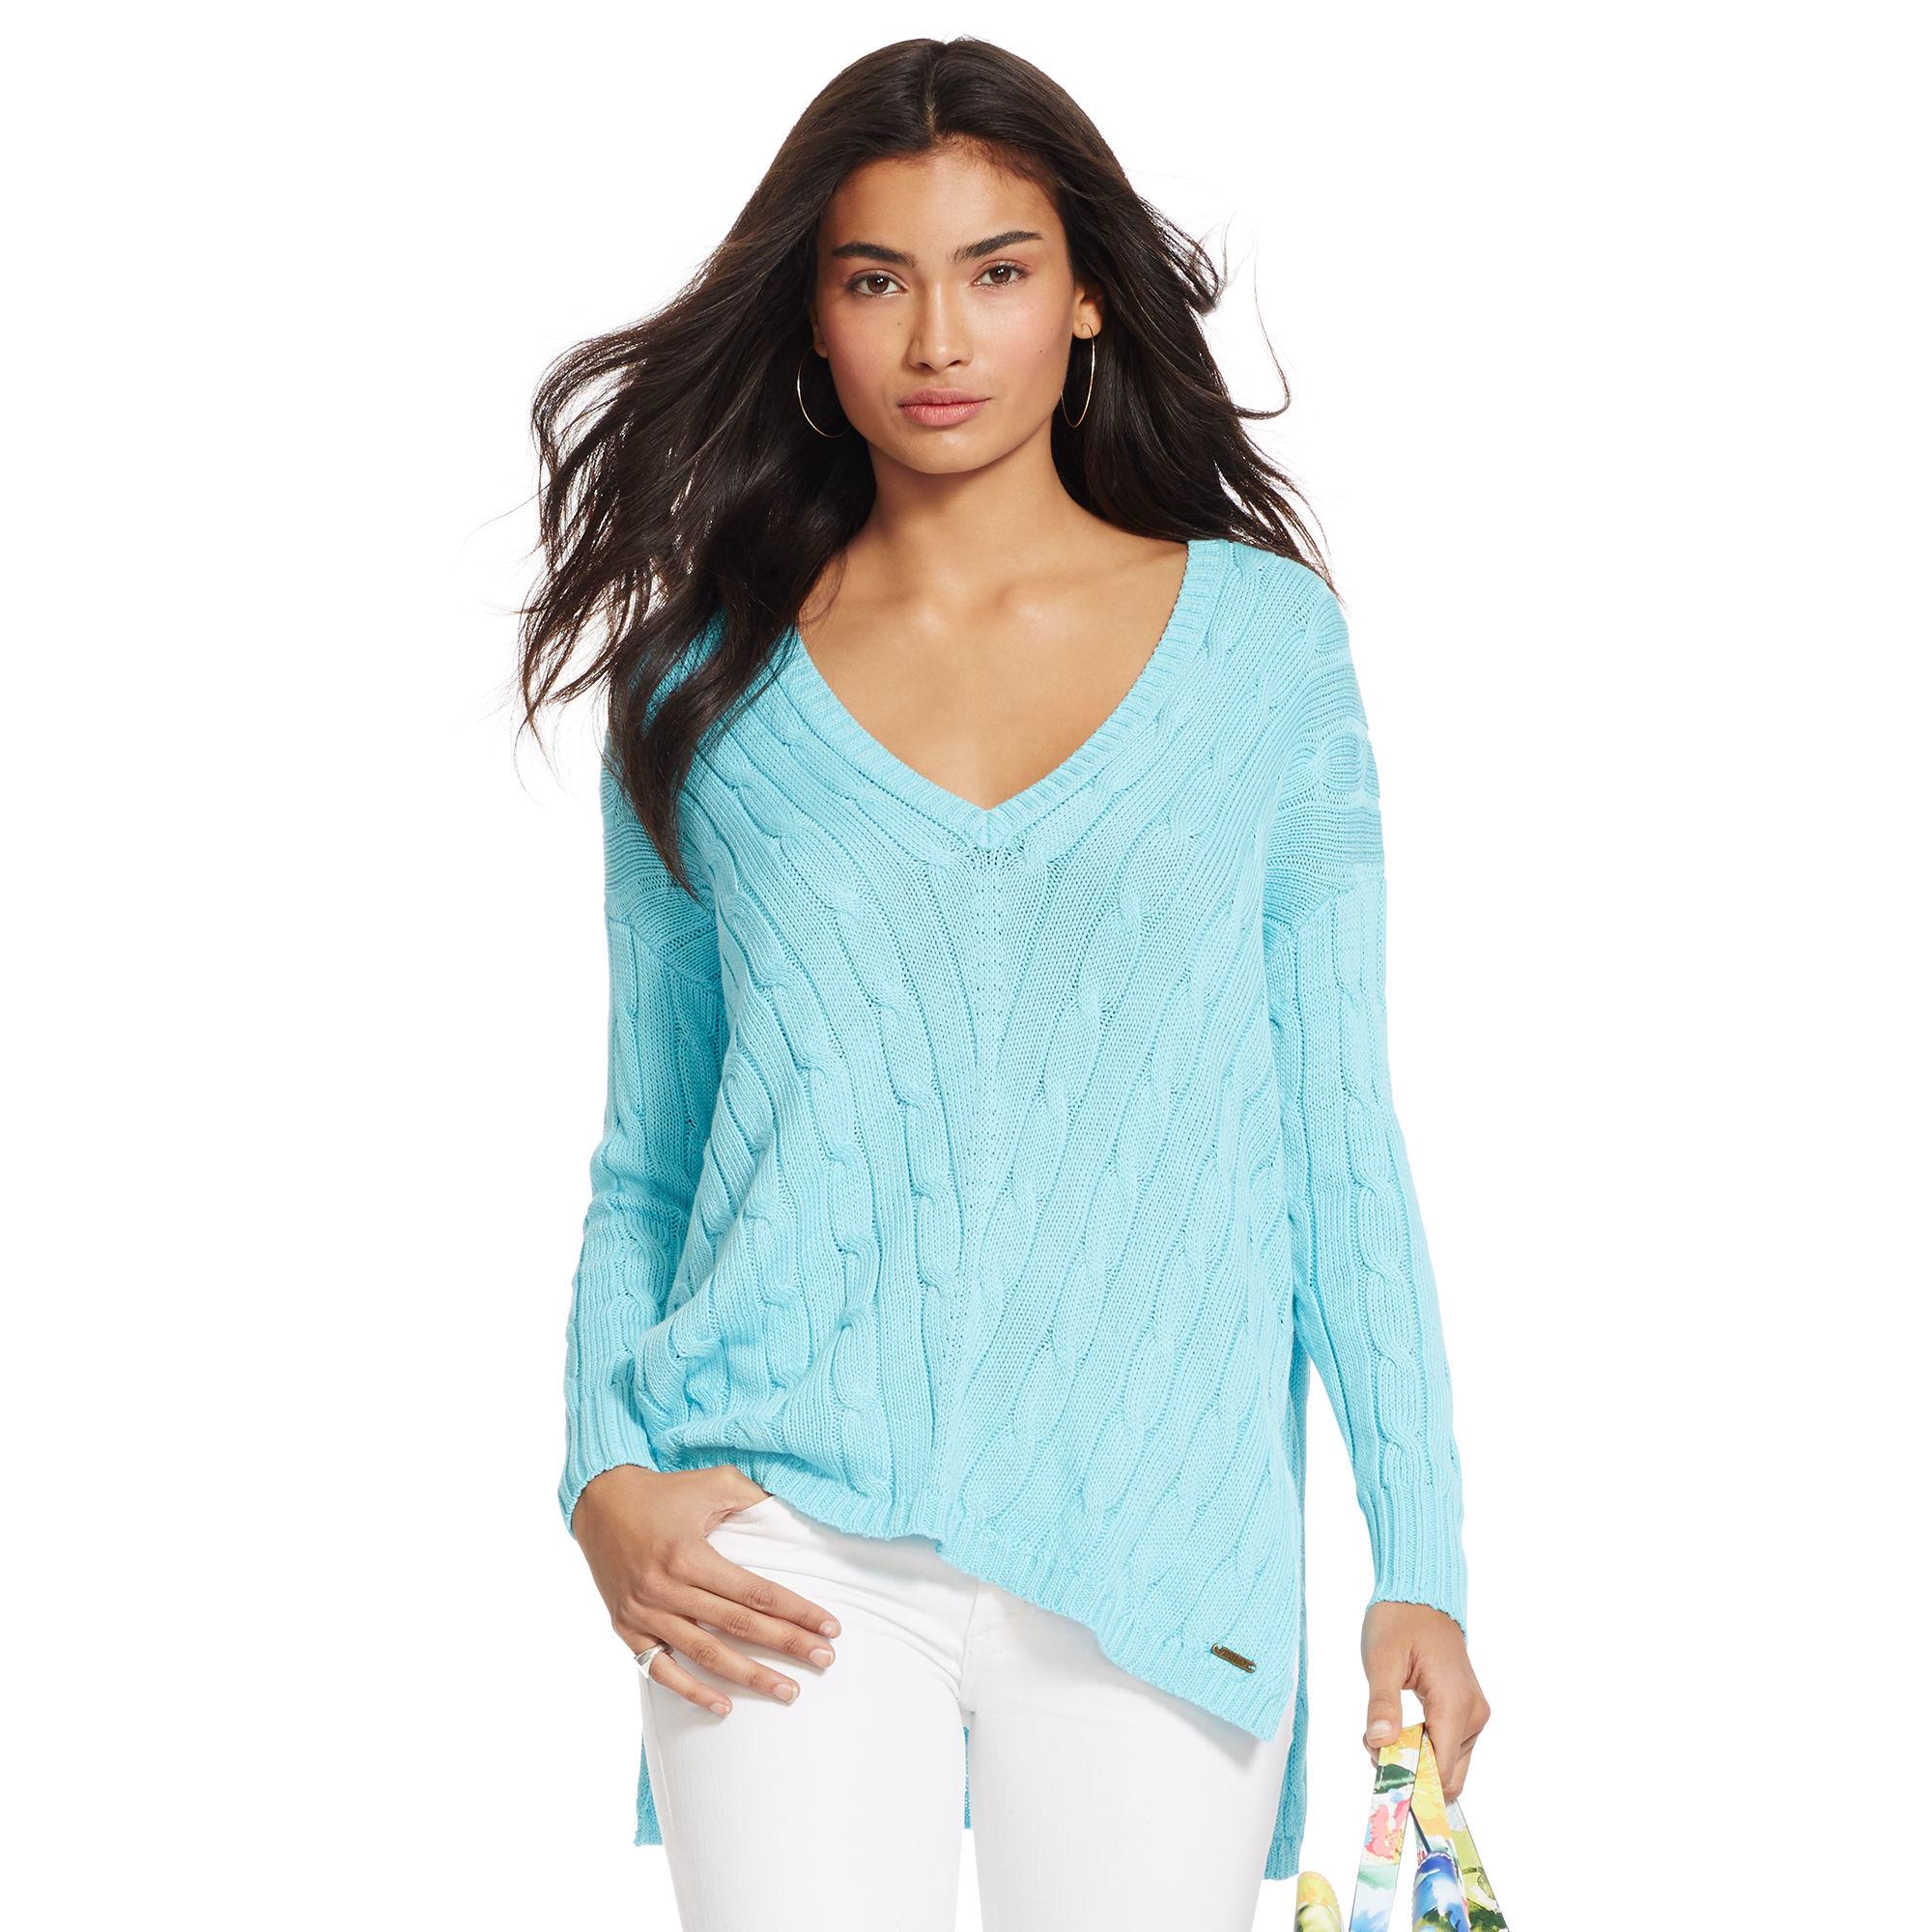 Polo Cable Knit Lauren Sweater Blue Ralph V Neck oBQerdCxW